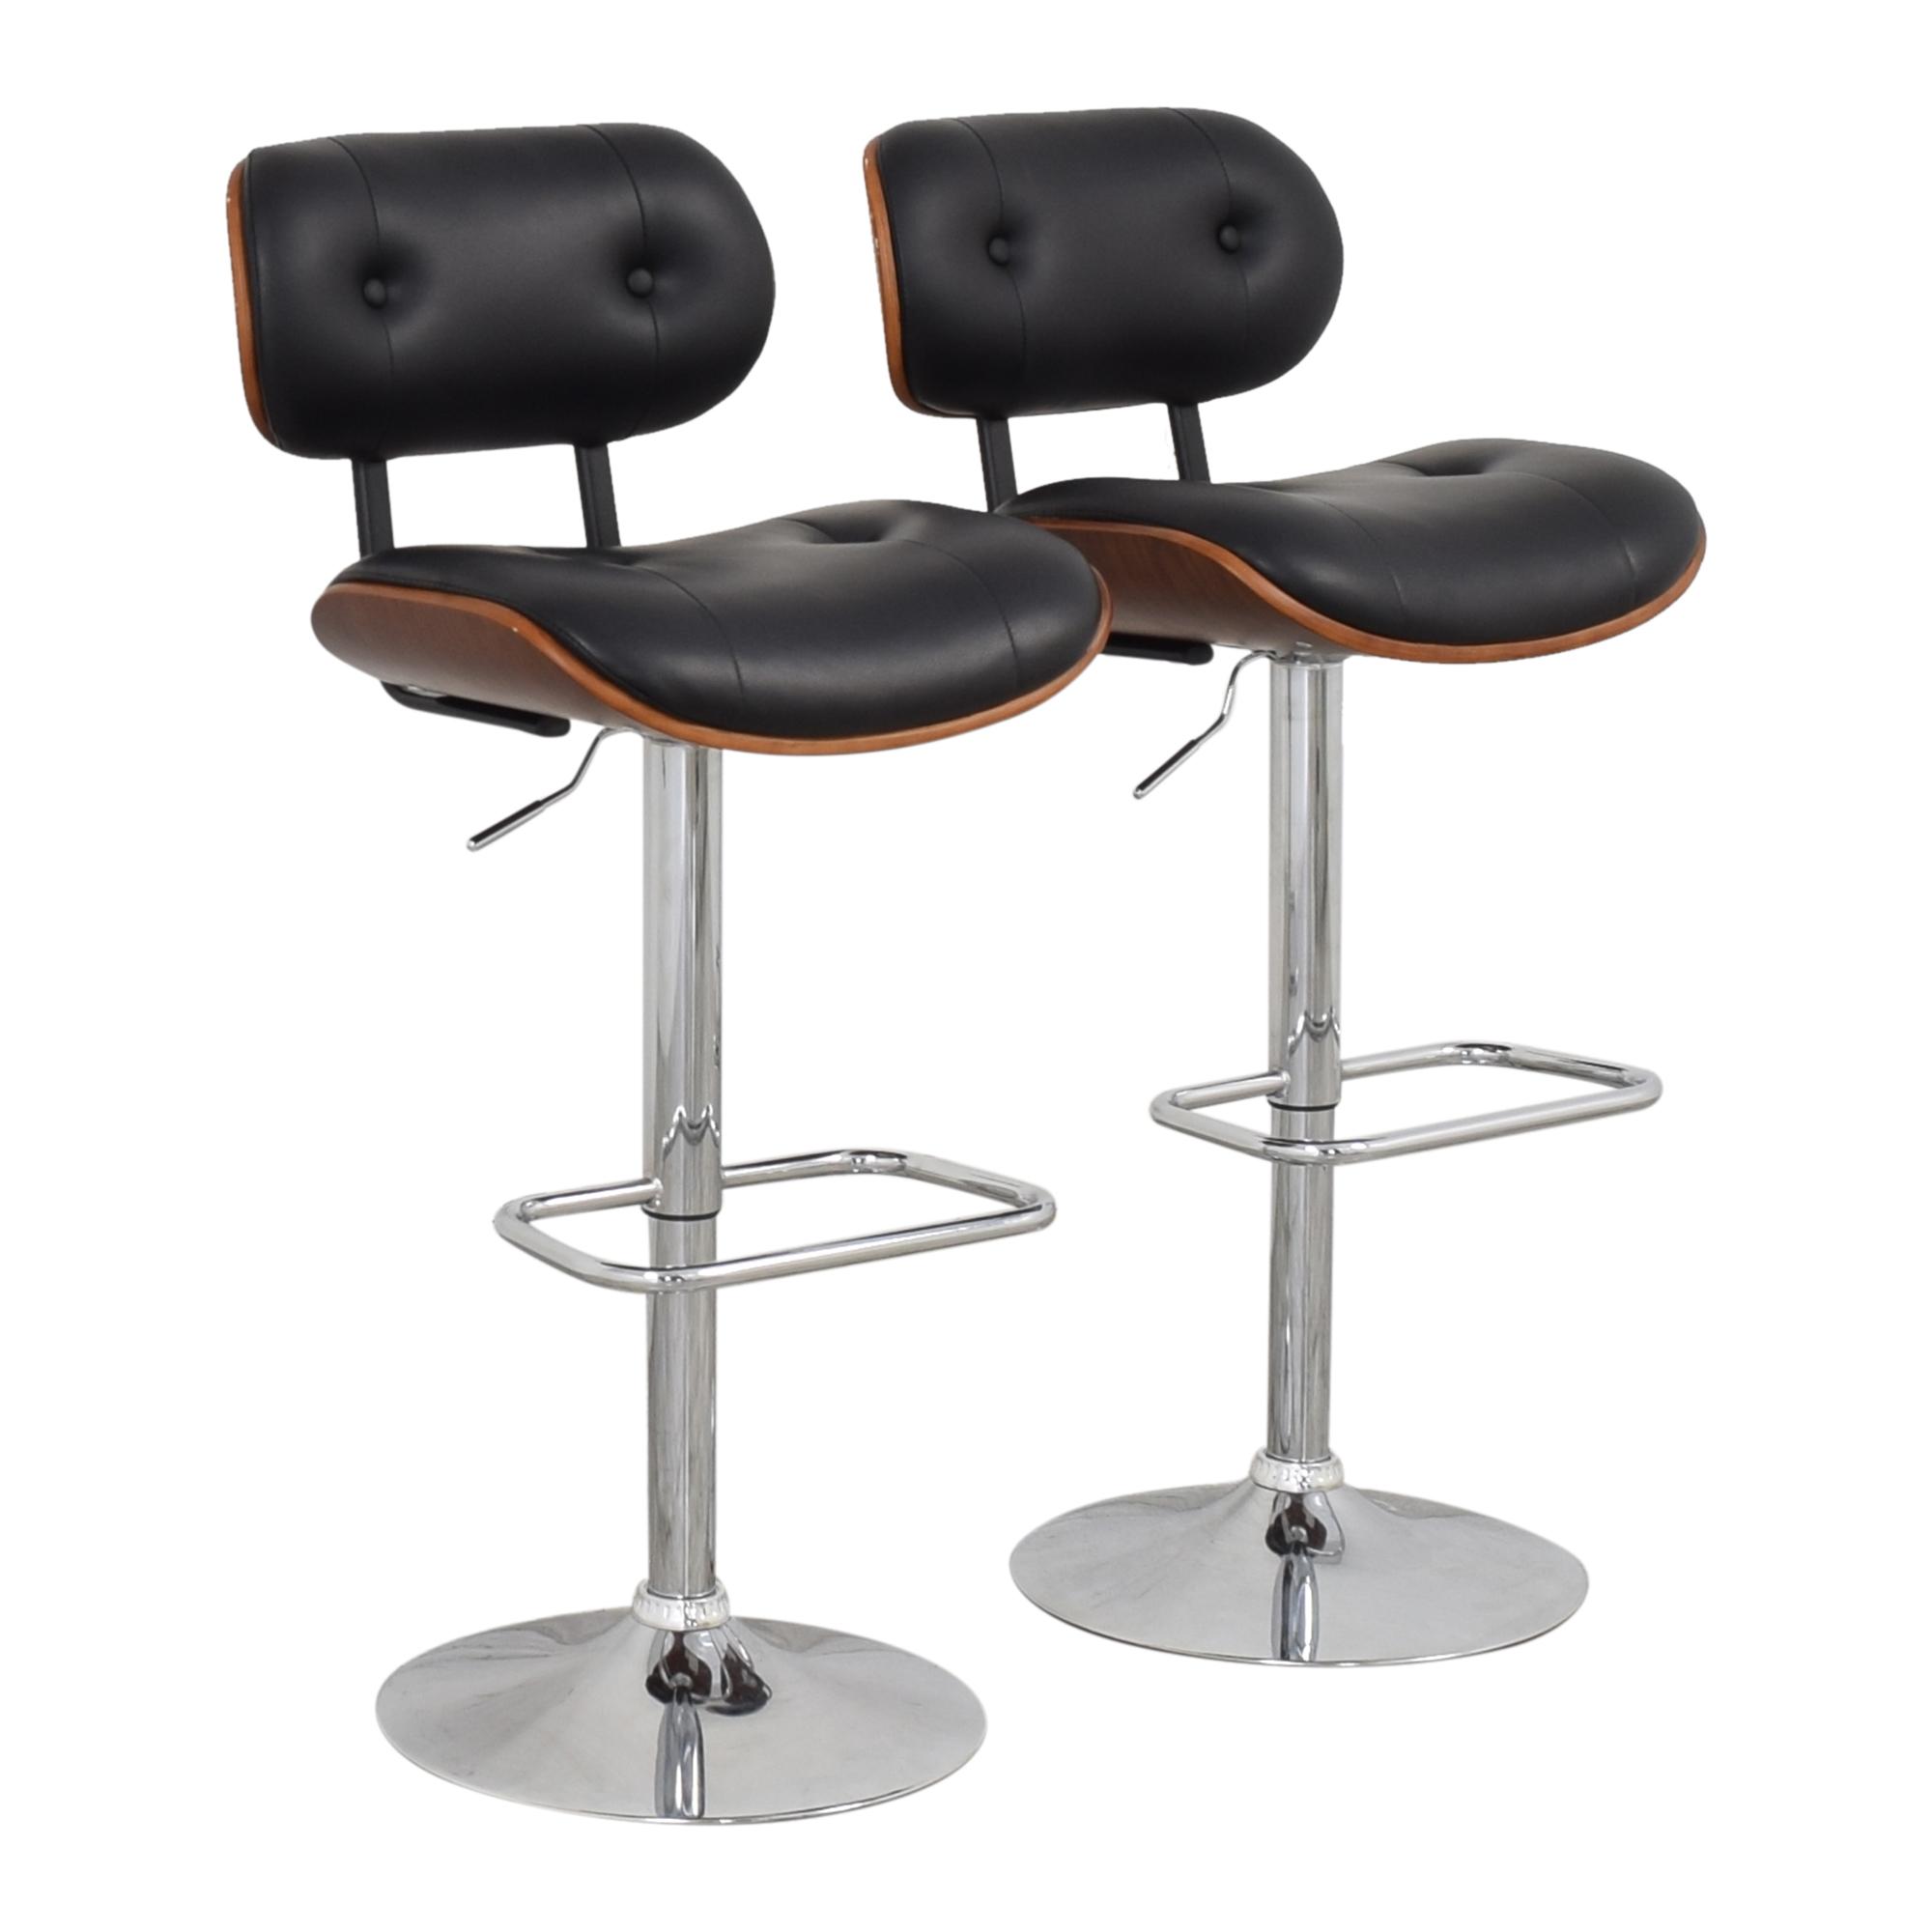 shop Wade Logan Catina Swivel Bar Stools Wayfair Chairs